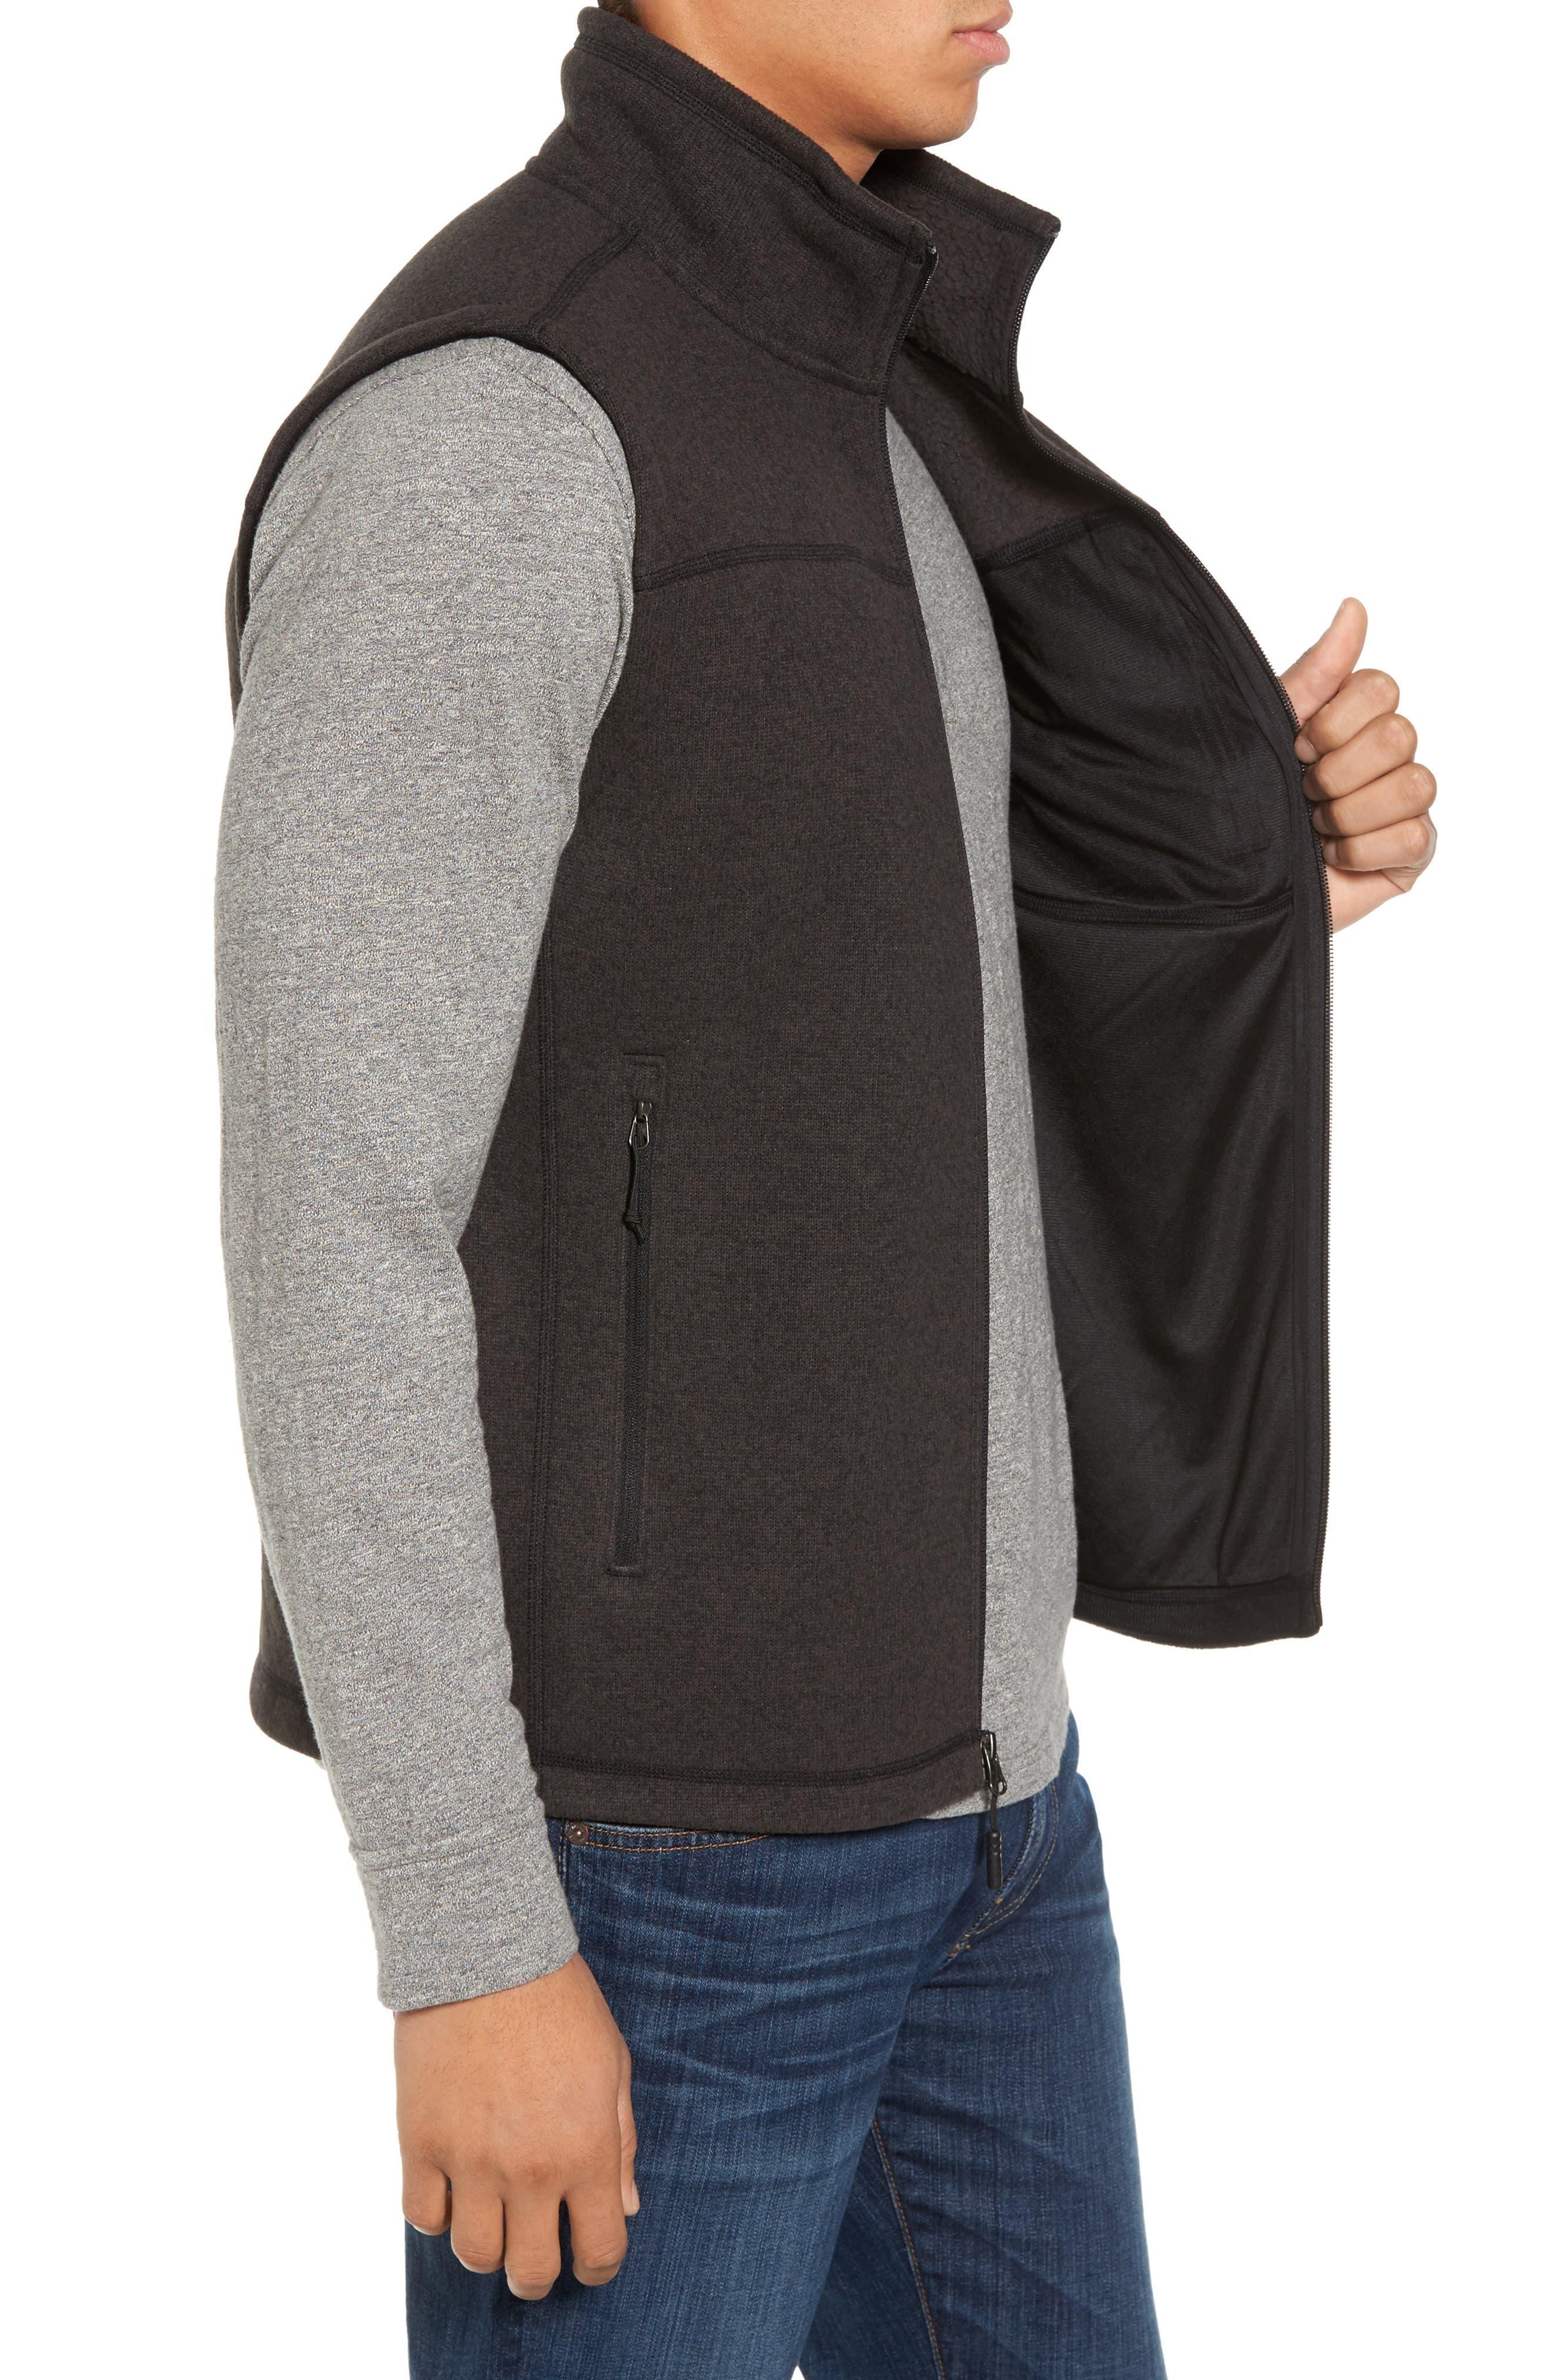 Gordon Lyons Zip Fleece Vest,                             Alternate thumbnail 11, color,